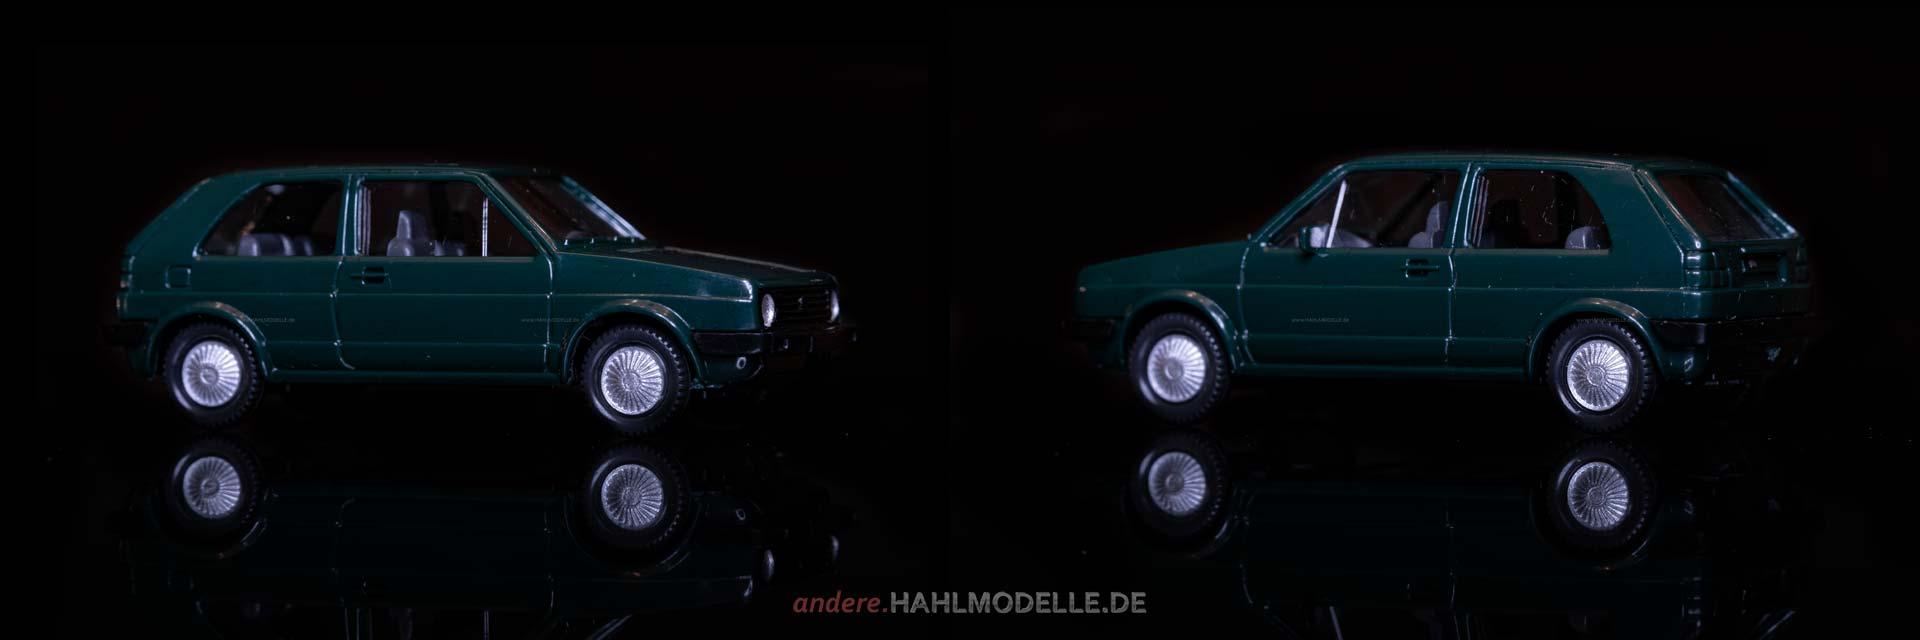 Volkswagen Golf II | Limousine (Typ 19E / 1G1) | Wiking | 1:87 | www.andere.hahlmodelle.de